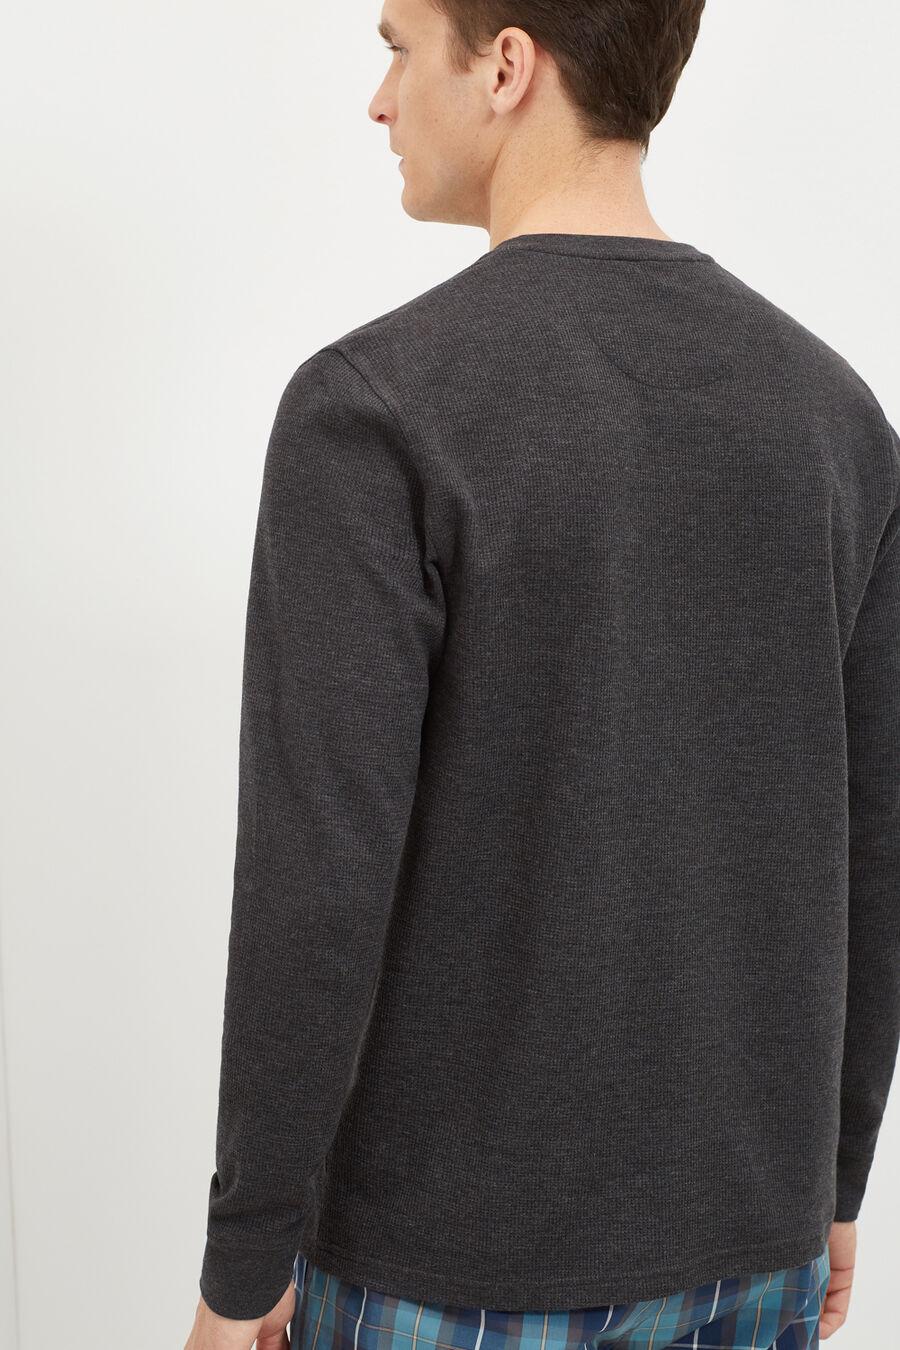 Camiseta de pijama manga larga